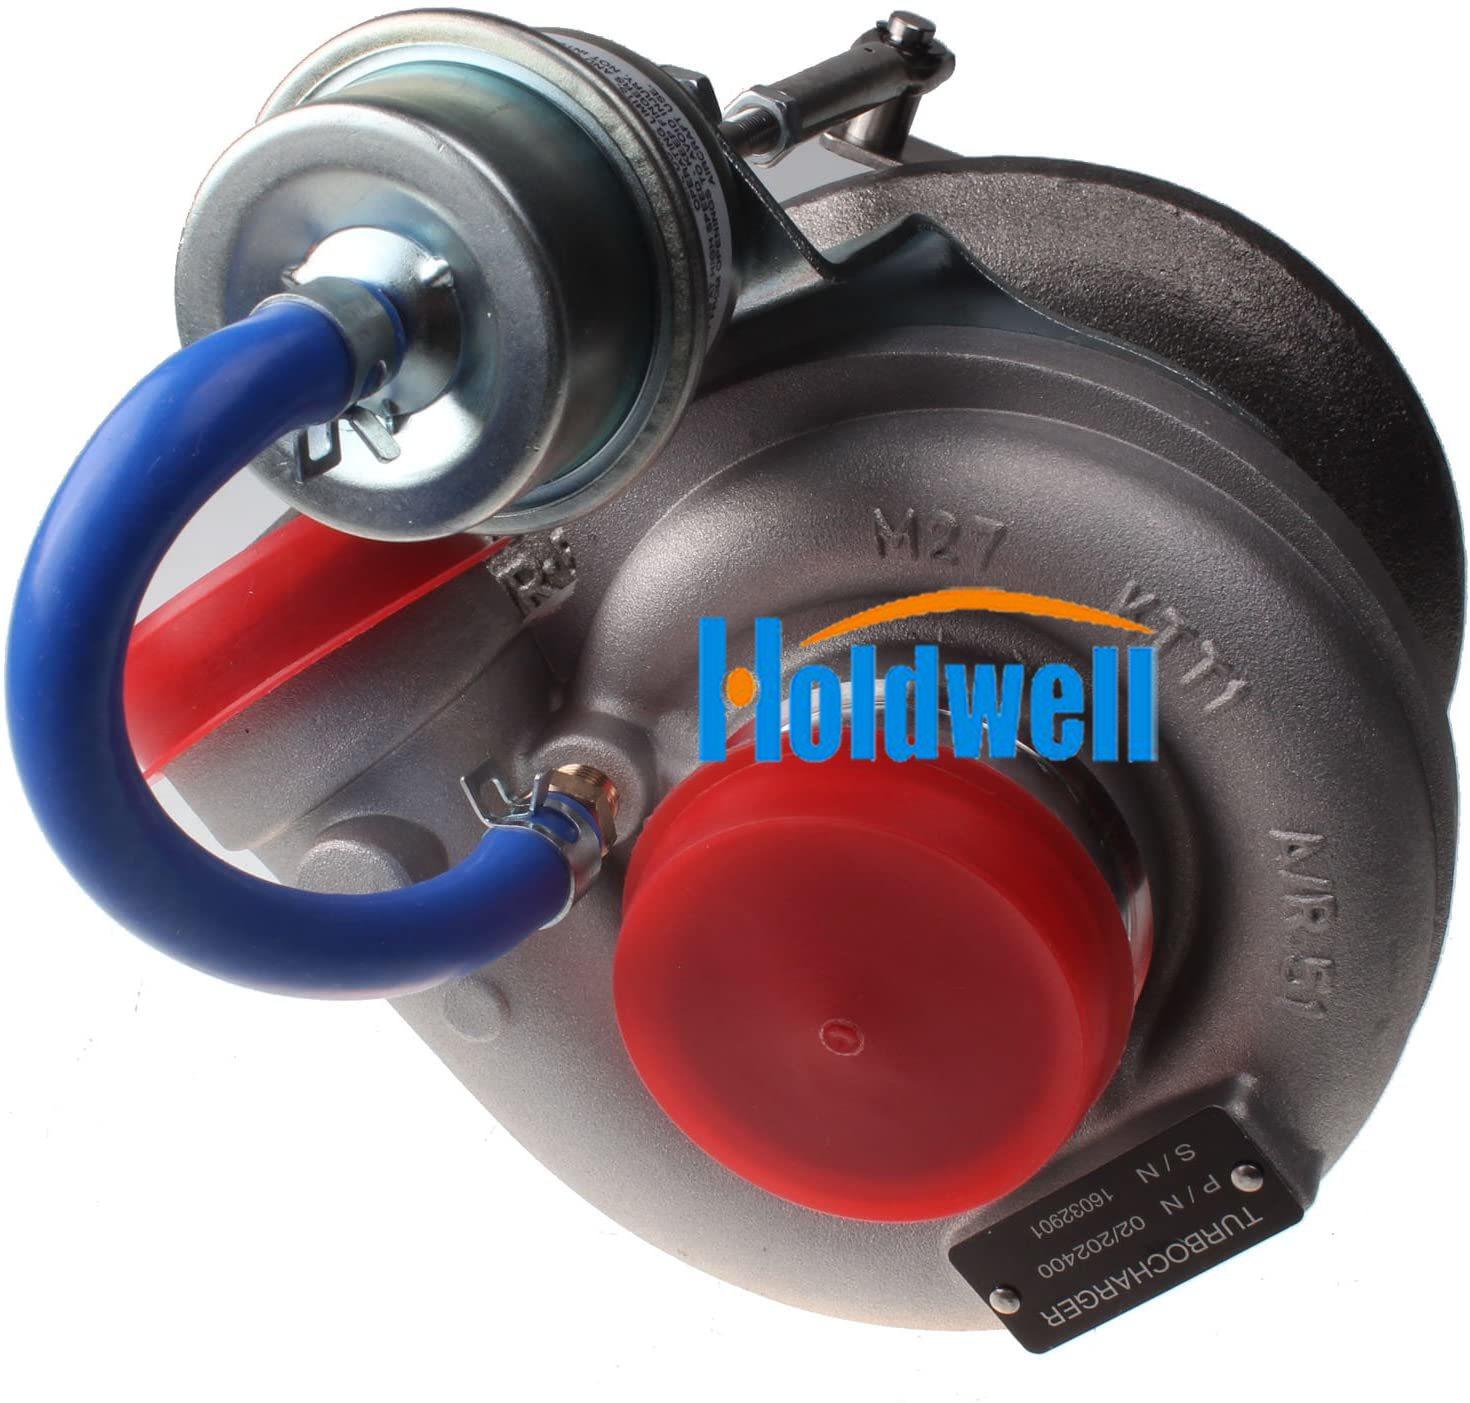 Turbocompresseur Holdwell 727266-5001S 02/202400 pour Perkins JCB Construction 537